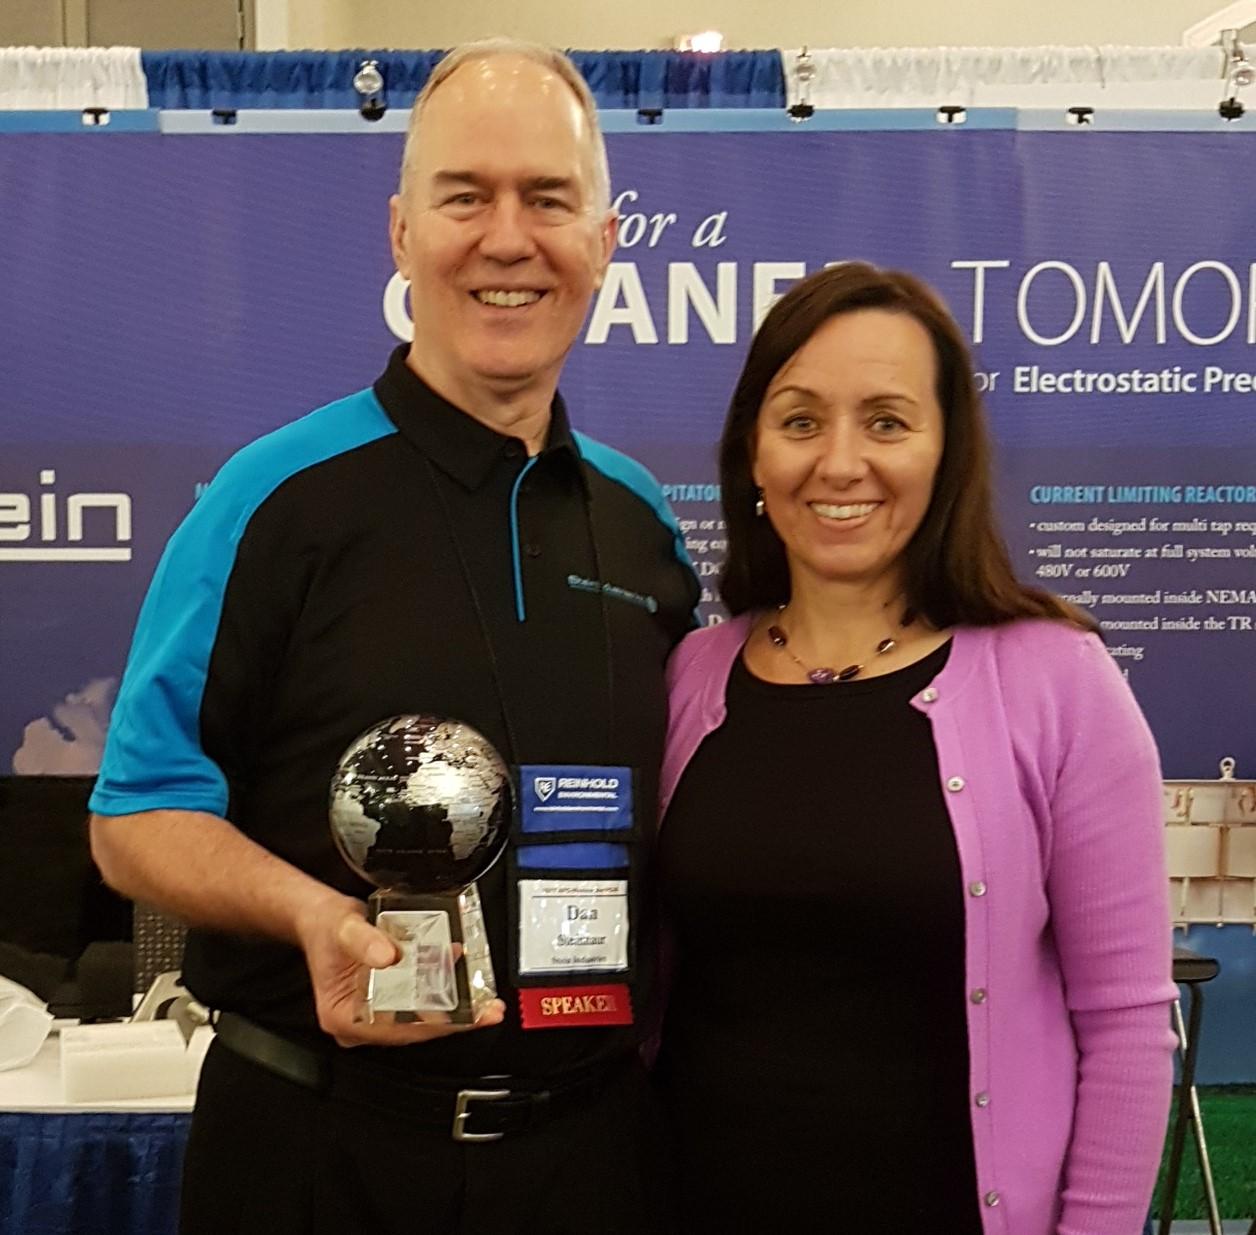 Dan Steinhaur Round Table Award 2017